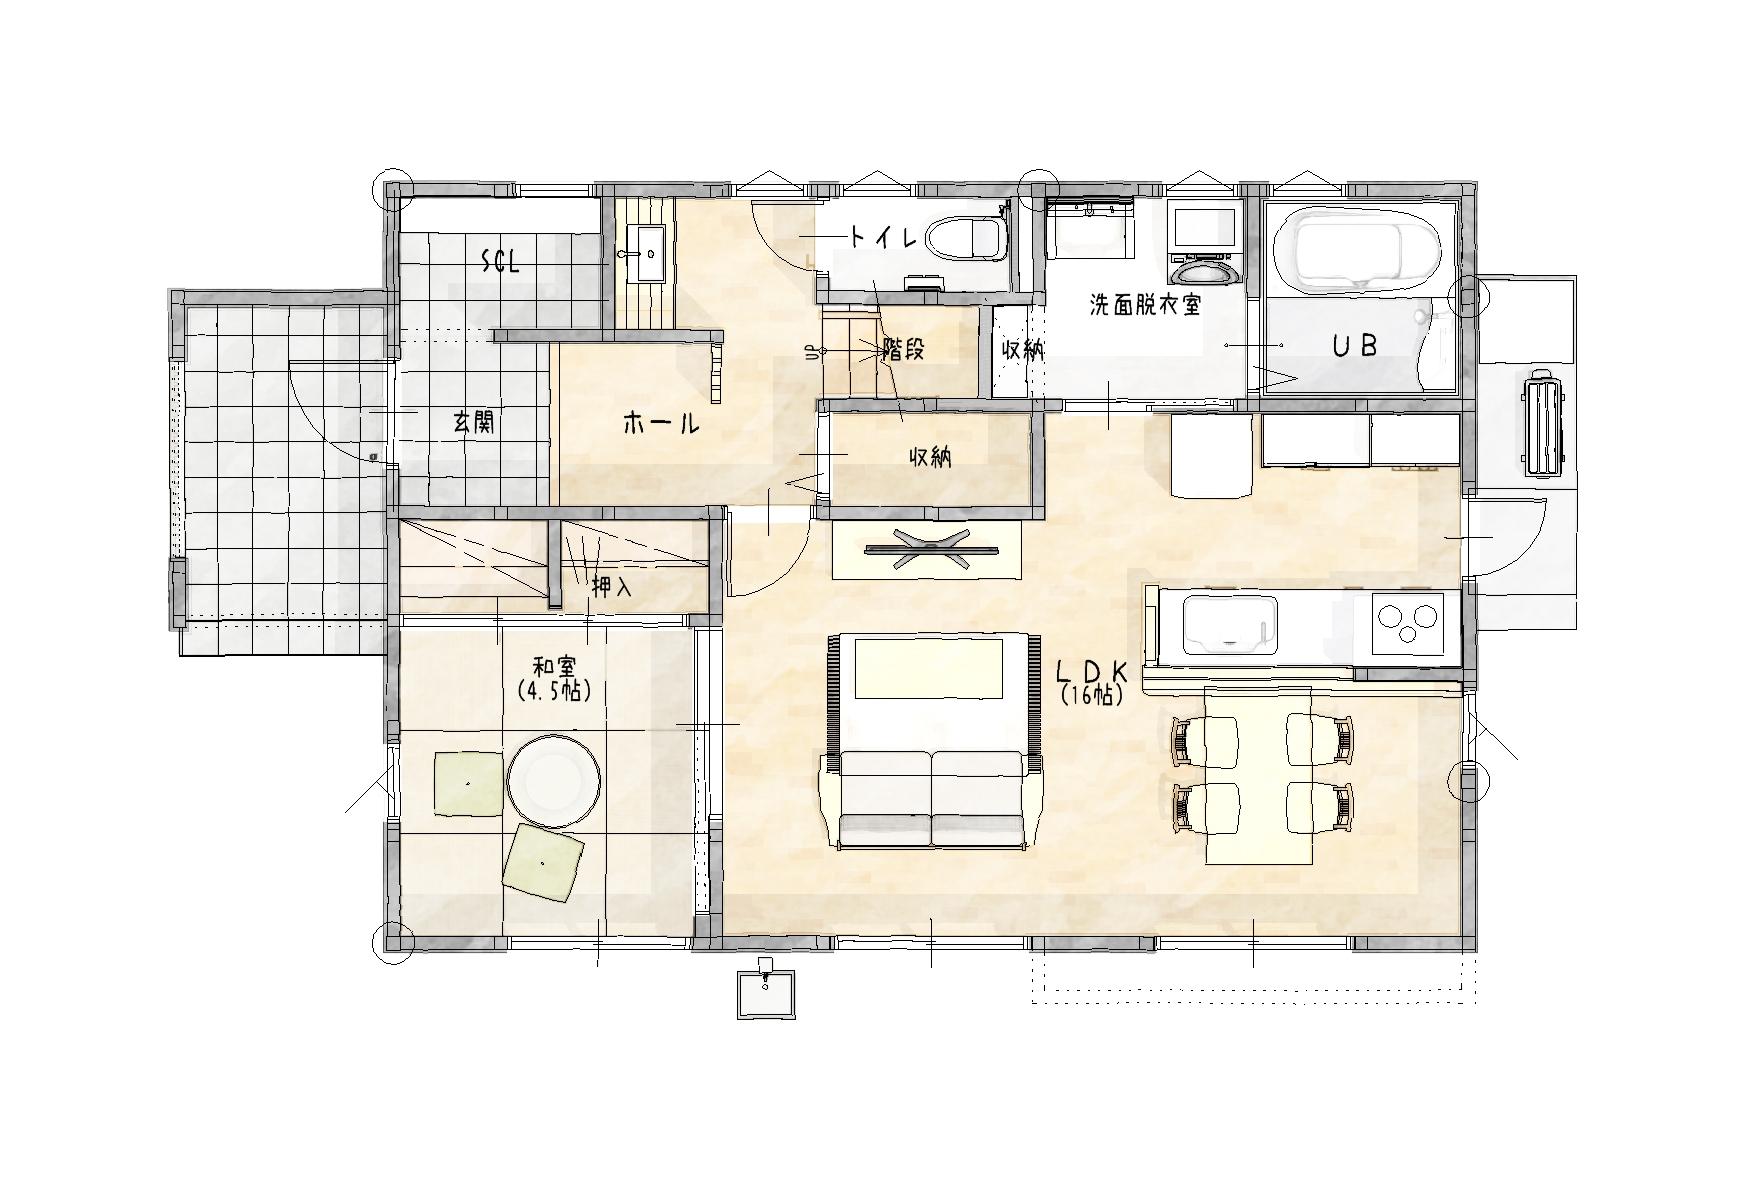 大村市新築建売住宅「OURS宮小路」1階間取り図